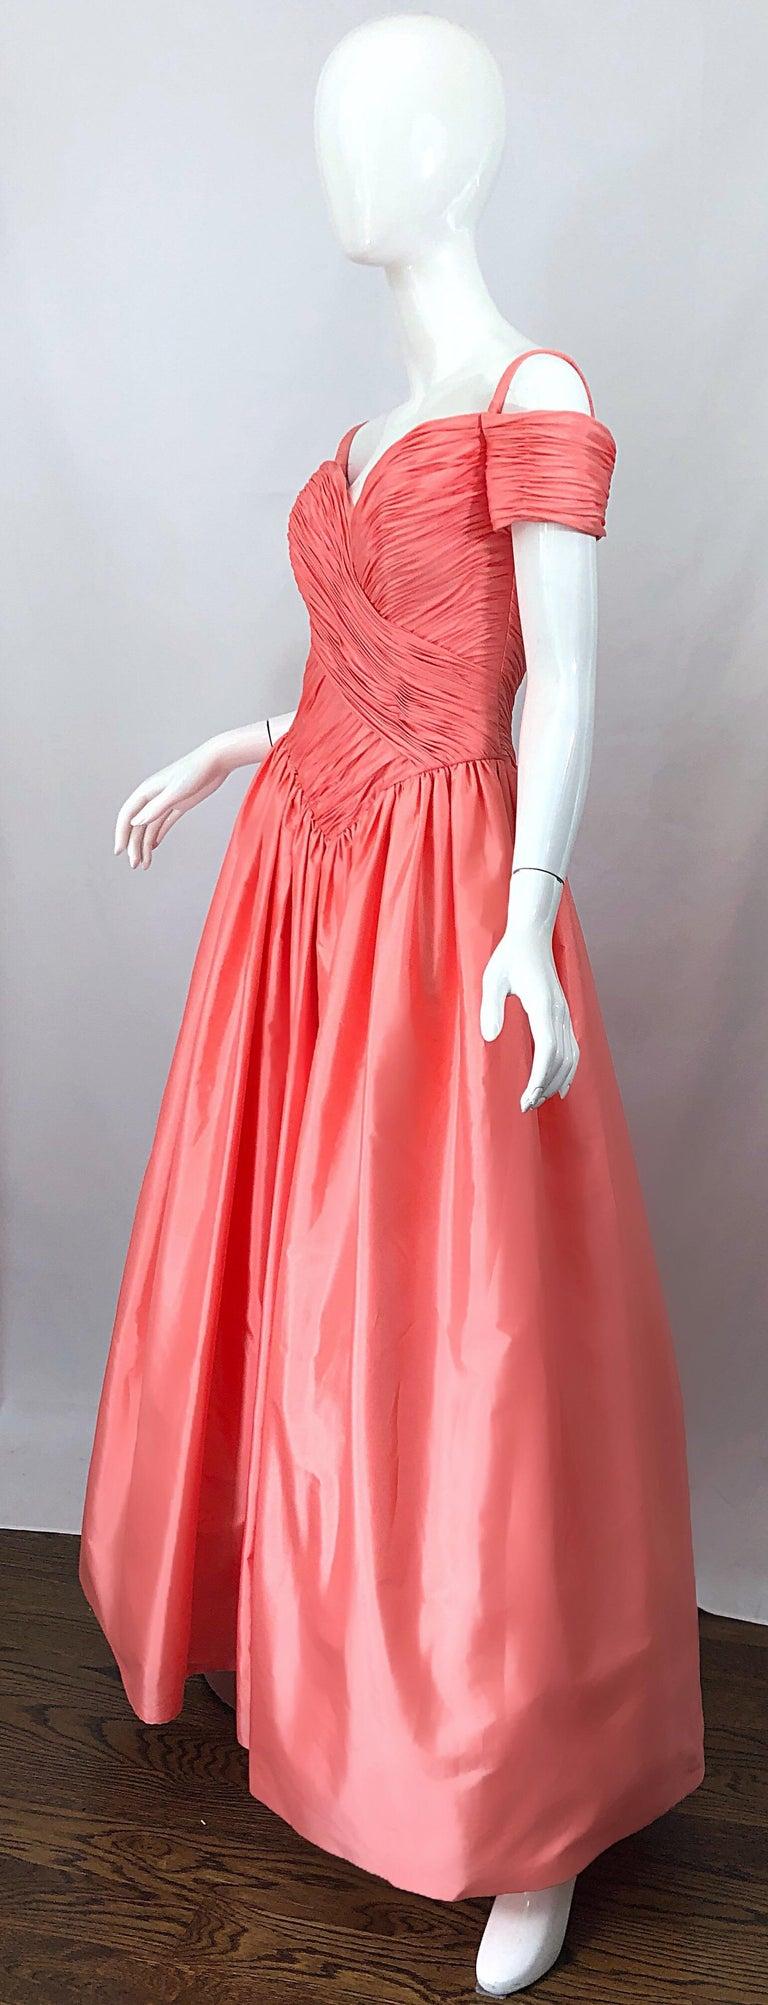 1980s Chris Kole Coral Pink Size 6 Off the Shoulder Silk Taffeta Vintage Gown For Sale 2